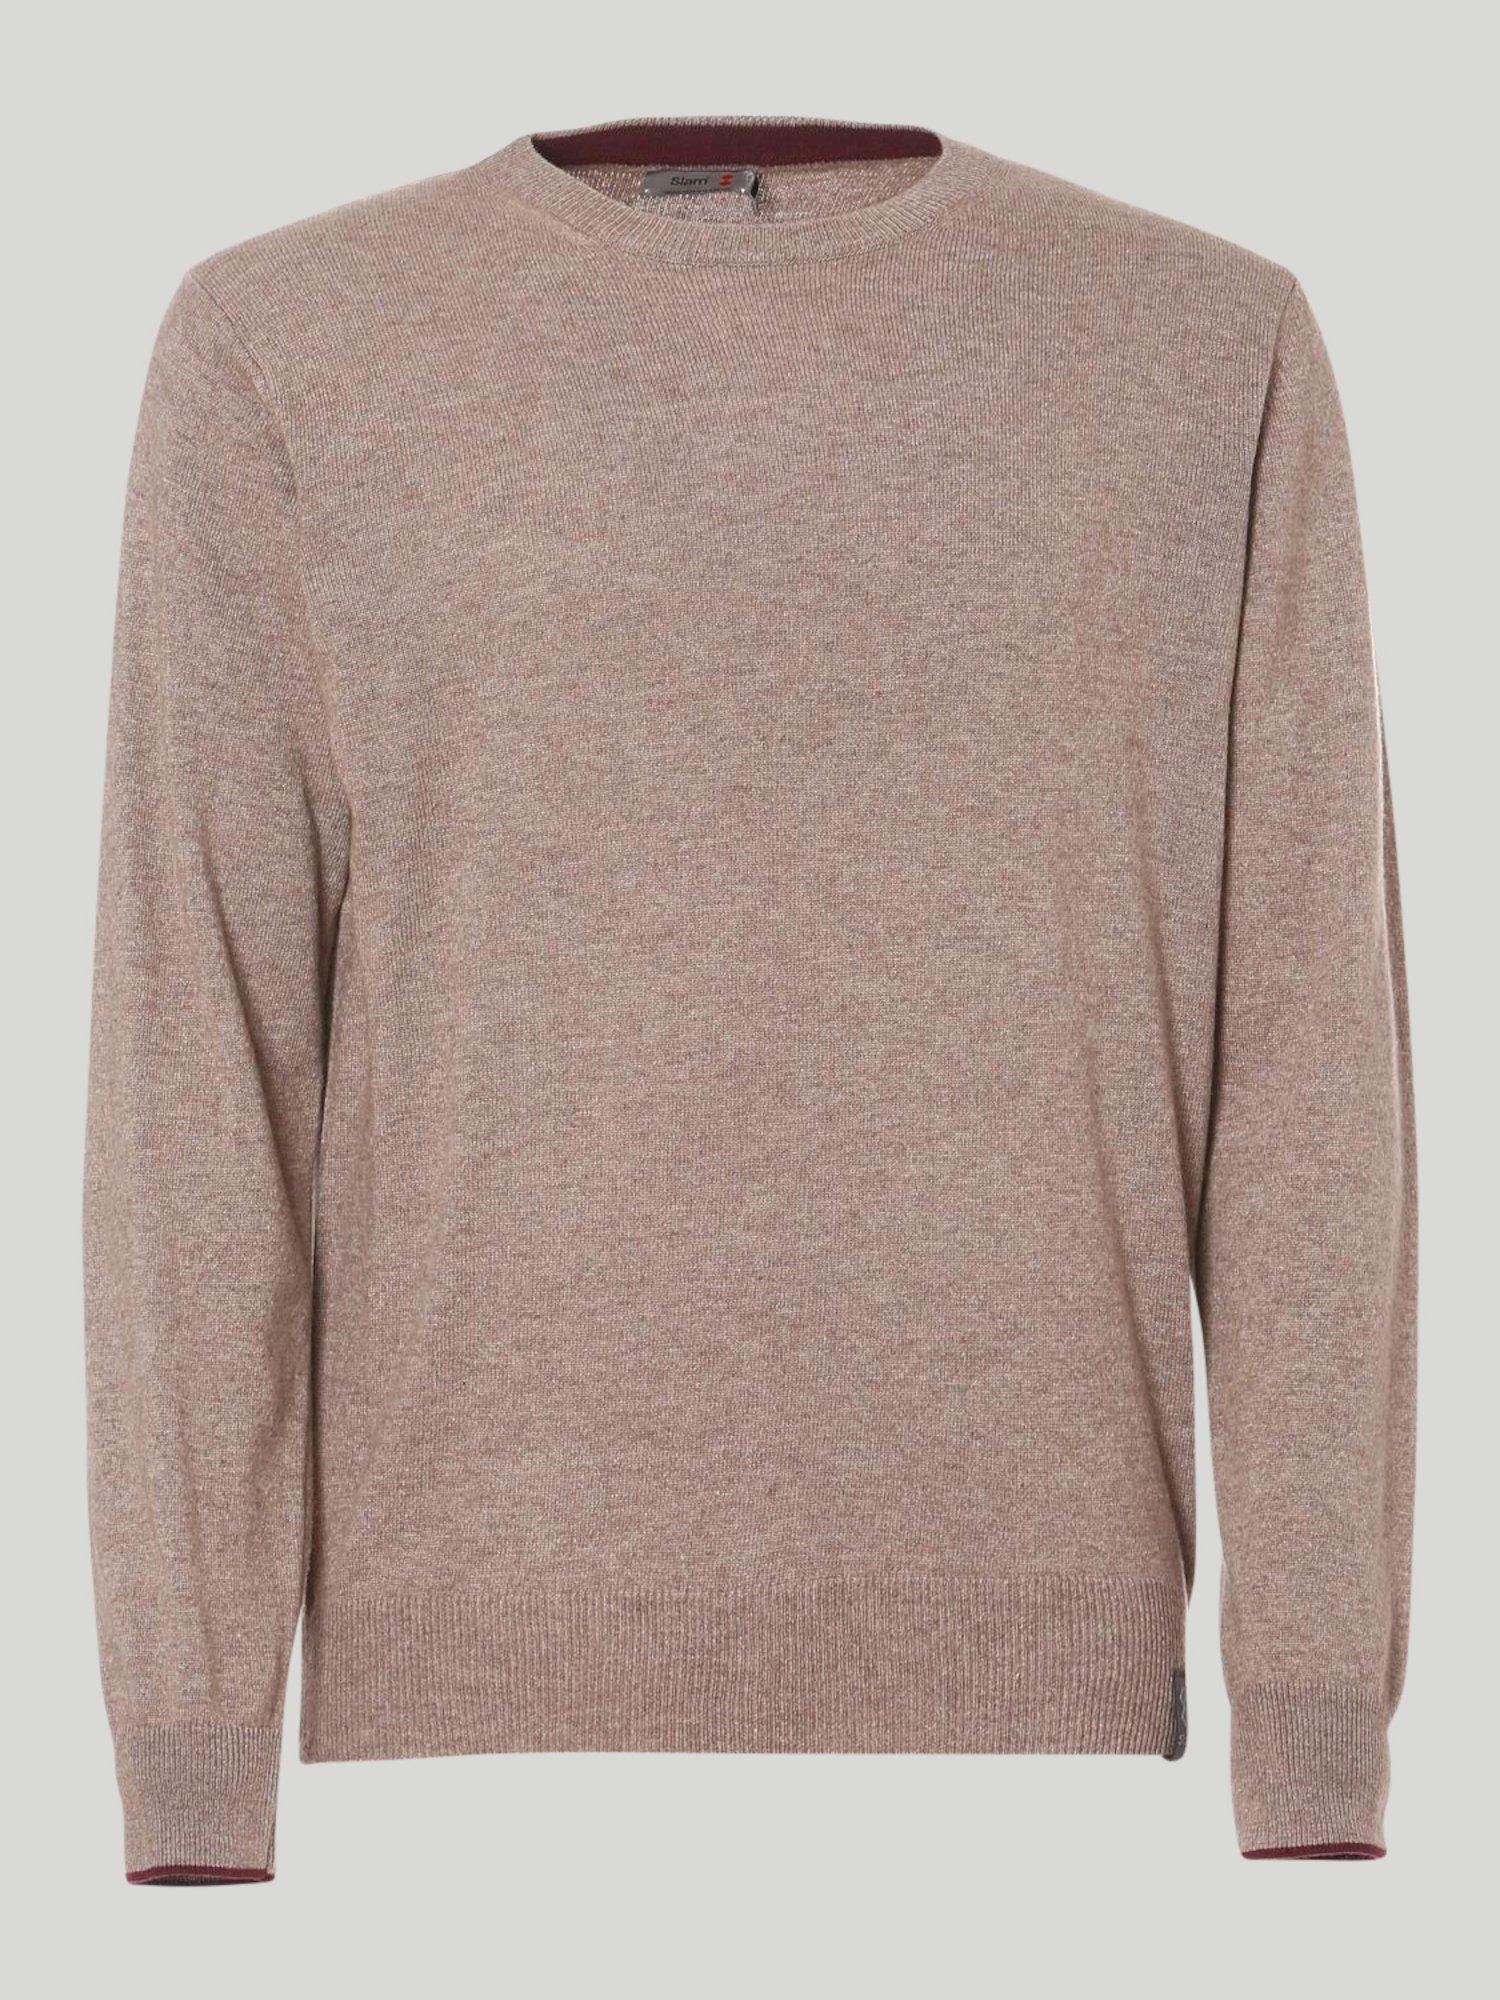 Shirt Devonshire - Beige Melange